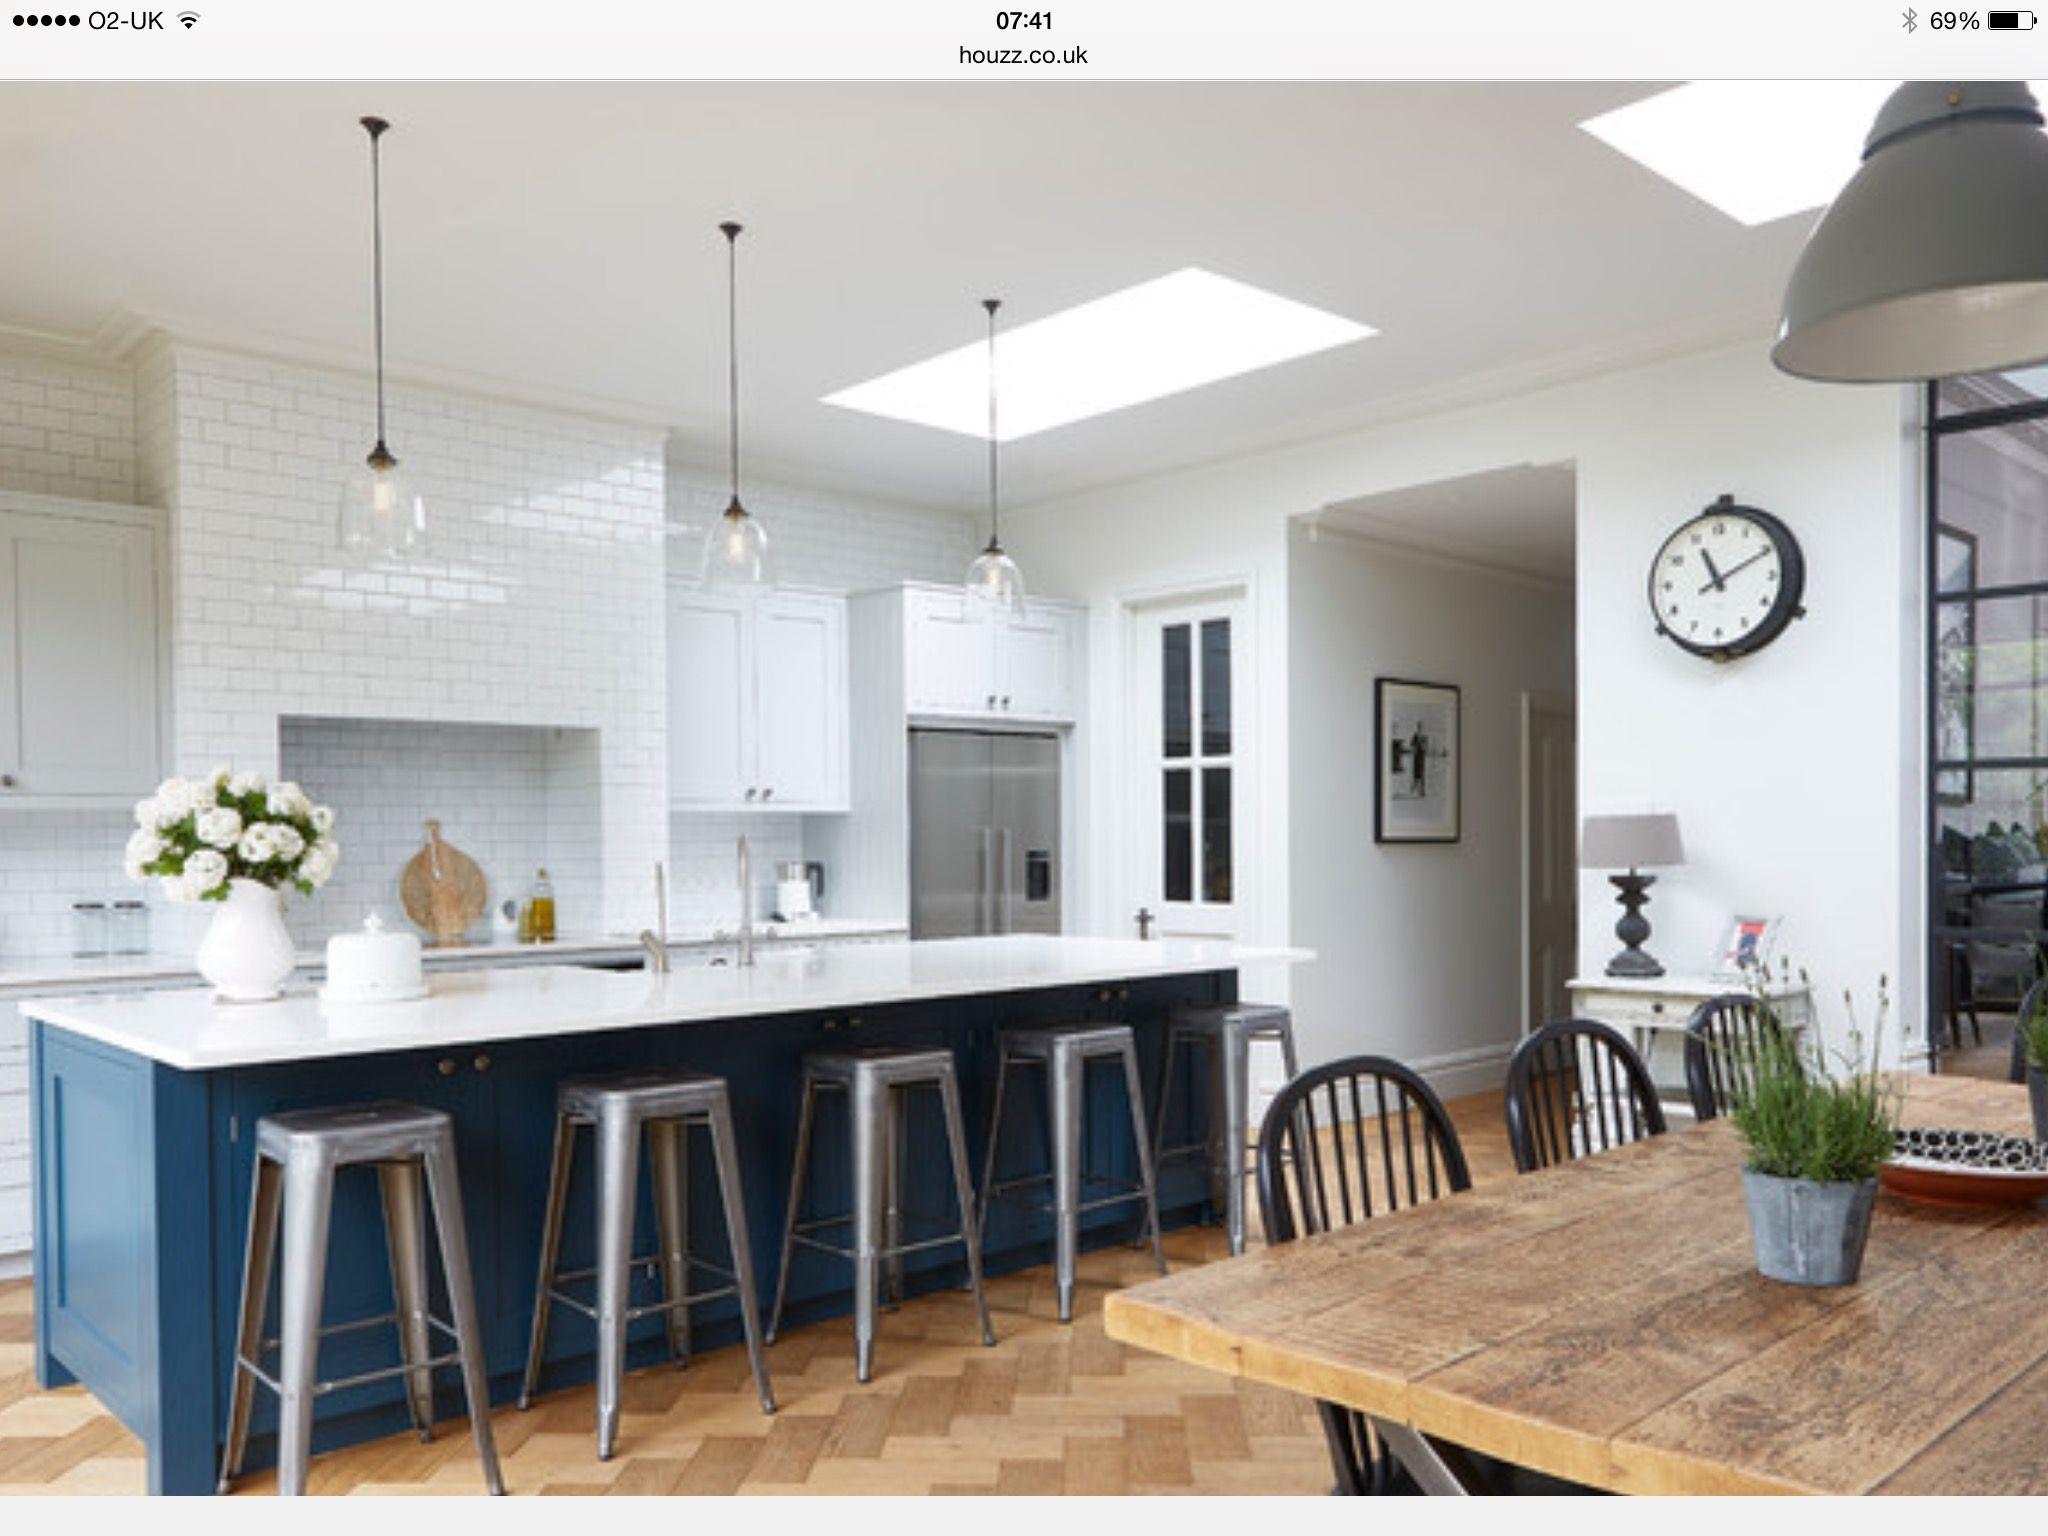 Open plan kitchen | Extension ideas | Pinterest | Open plan kitchen ...